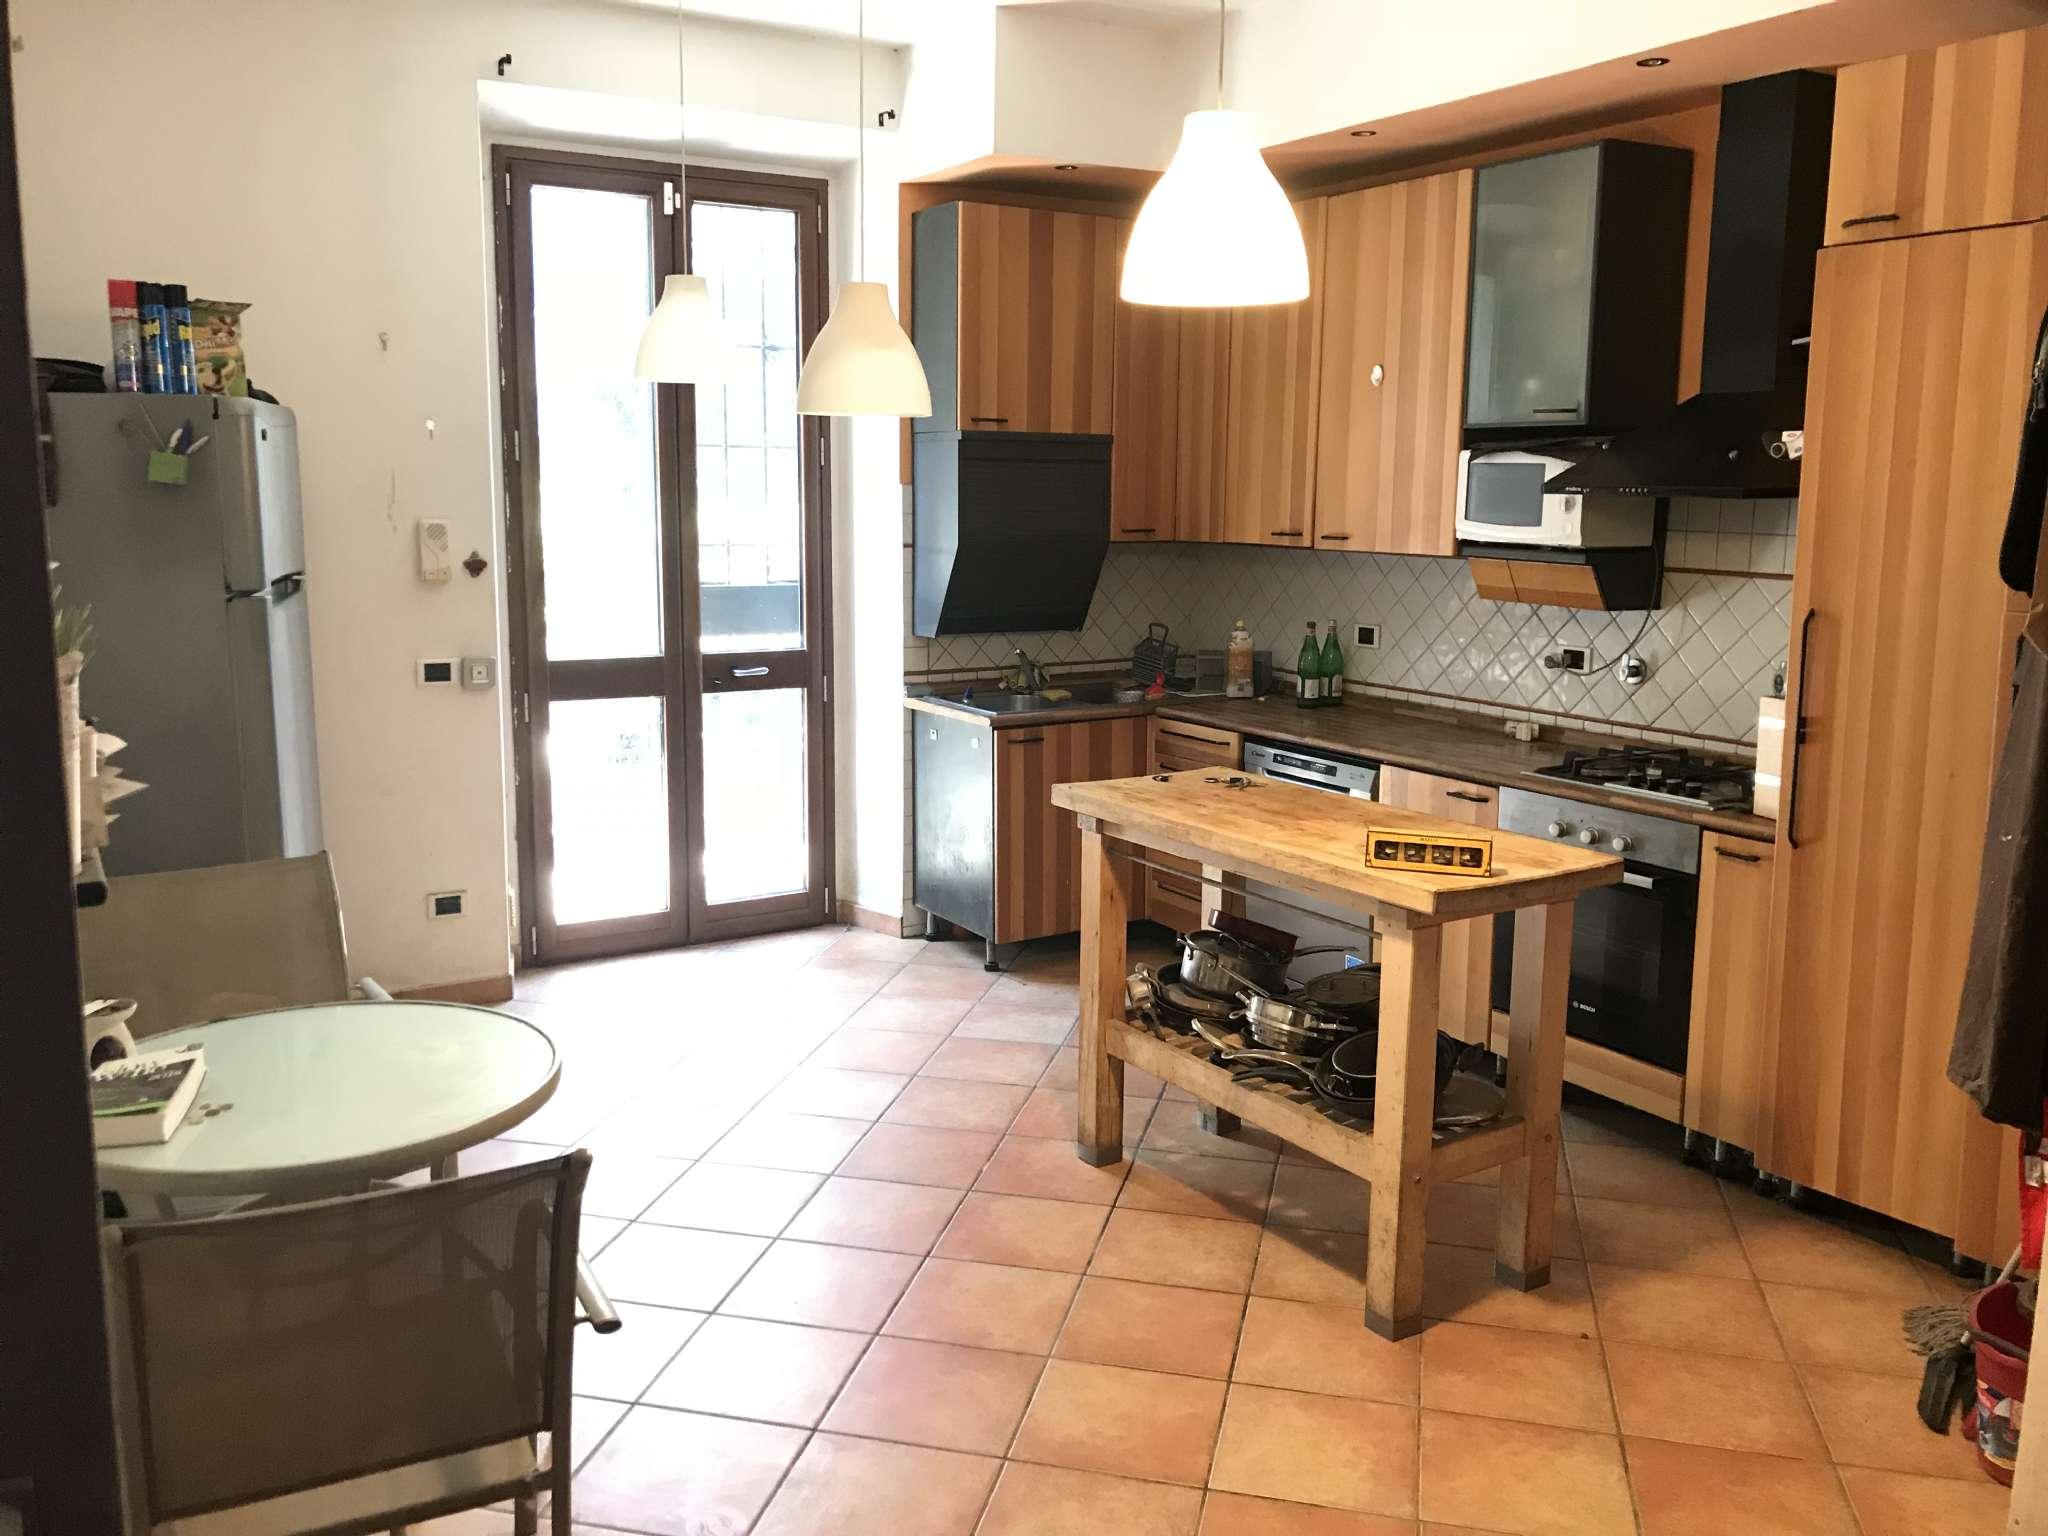 Appartamento in Vendita a Firenze Periferia Nord:  5 locali, 130 mq  - Foto 1